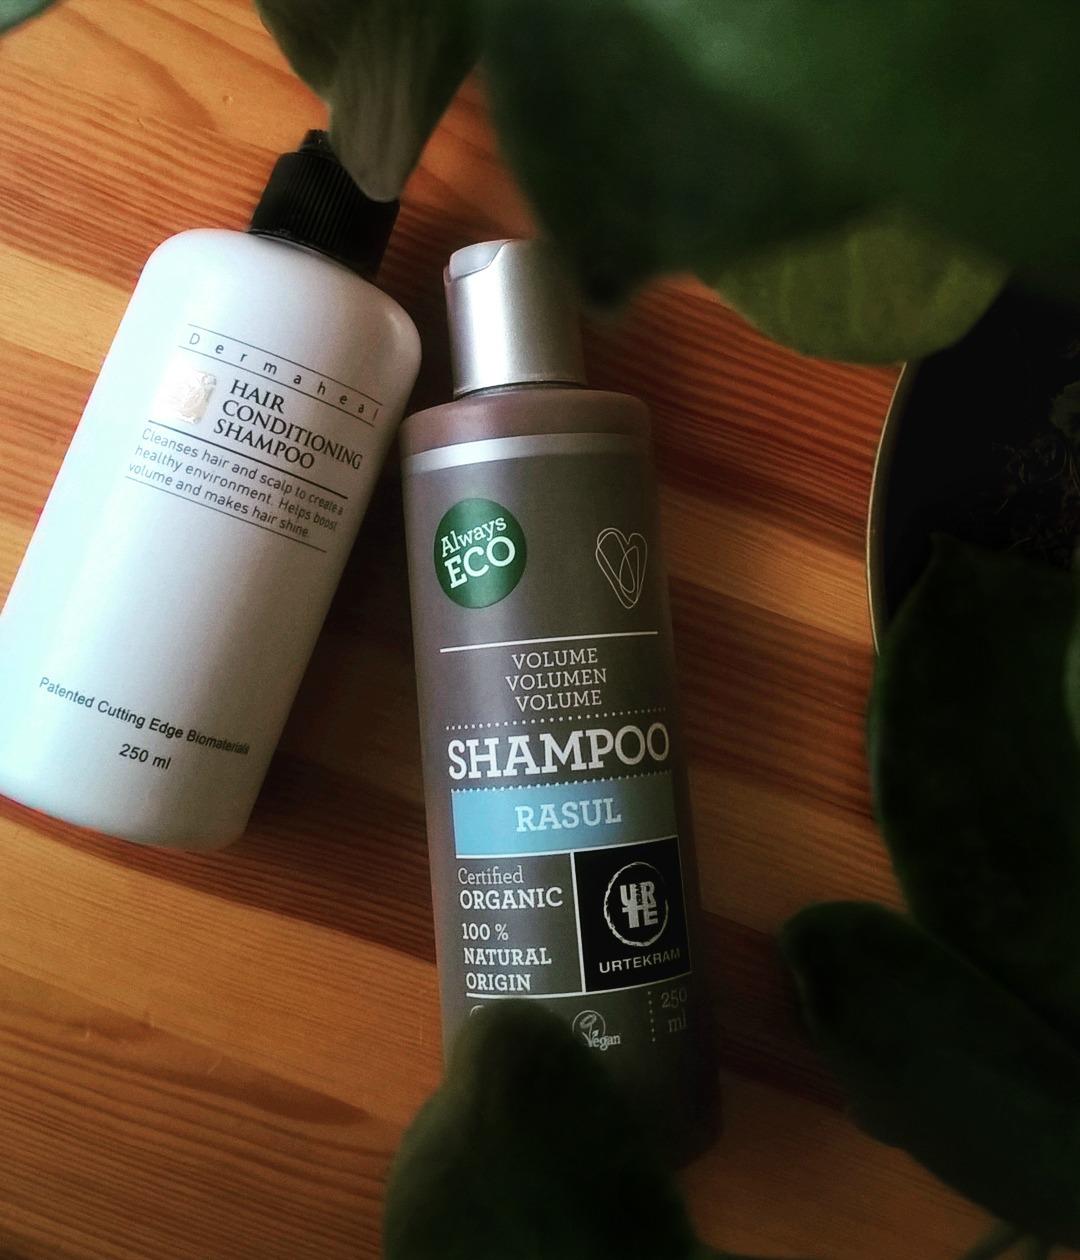 Dermaheal szampon & Urtekram szampon z glinką